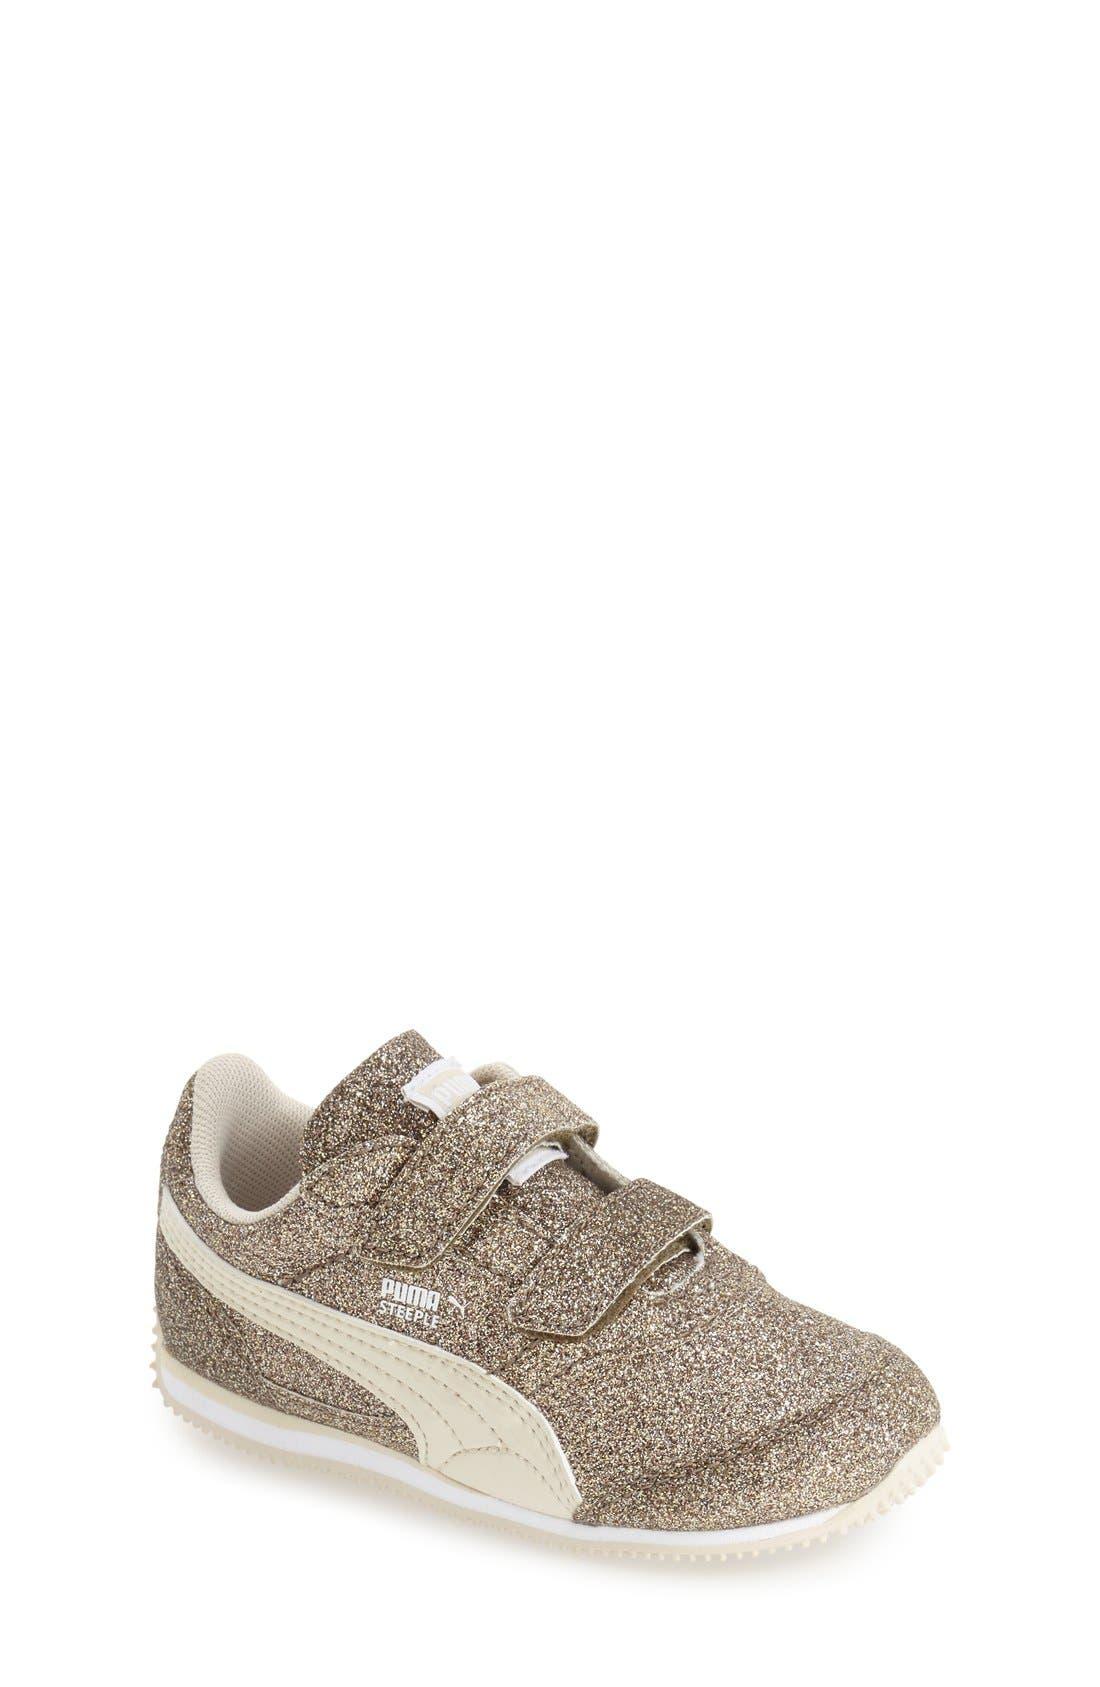 PUMA Steeple Glitz Sneaker